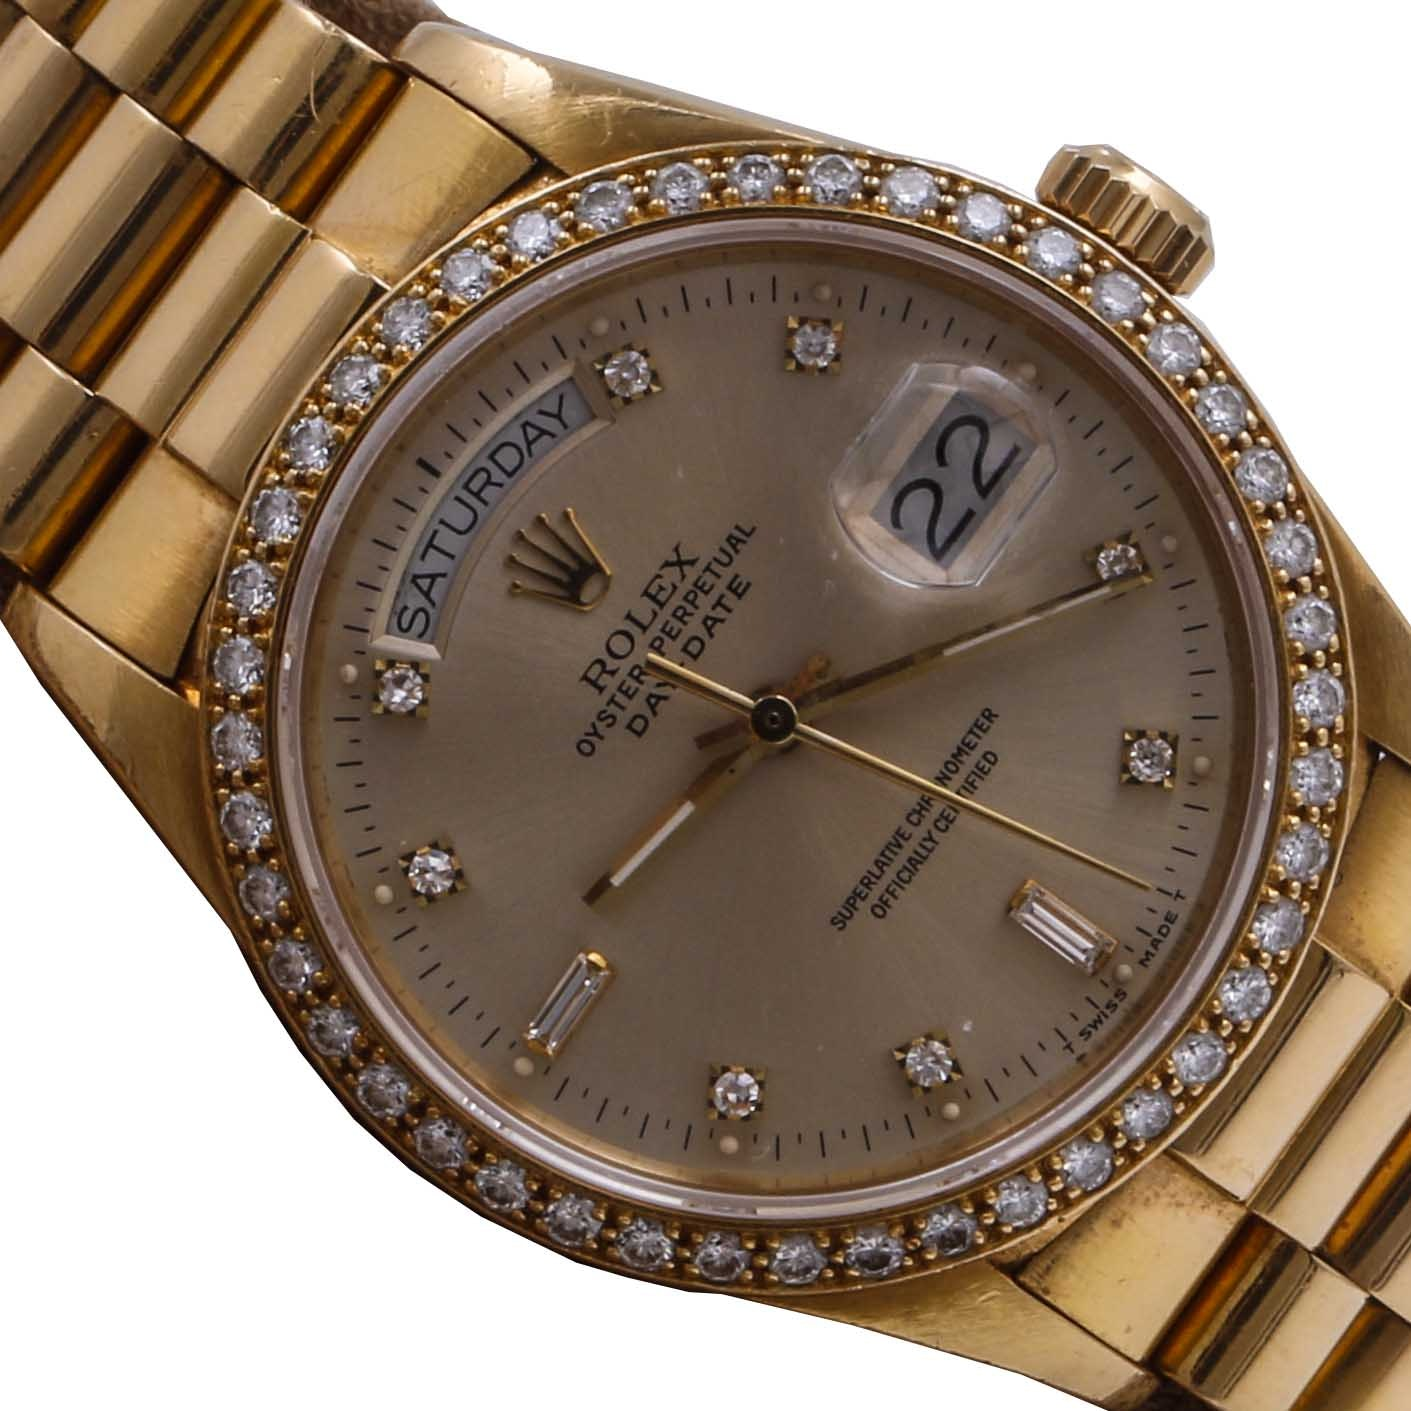 18K Yellow Gold 1.34 CTW Diamond Rolex Oyster Perpetual Wristwatch